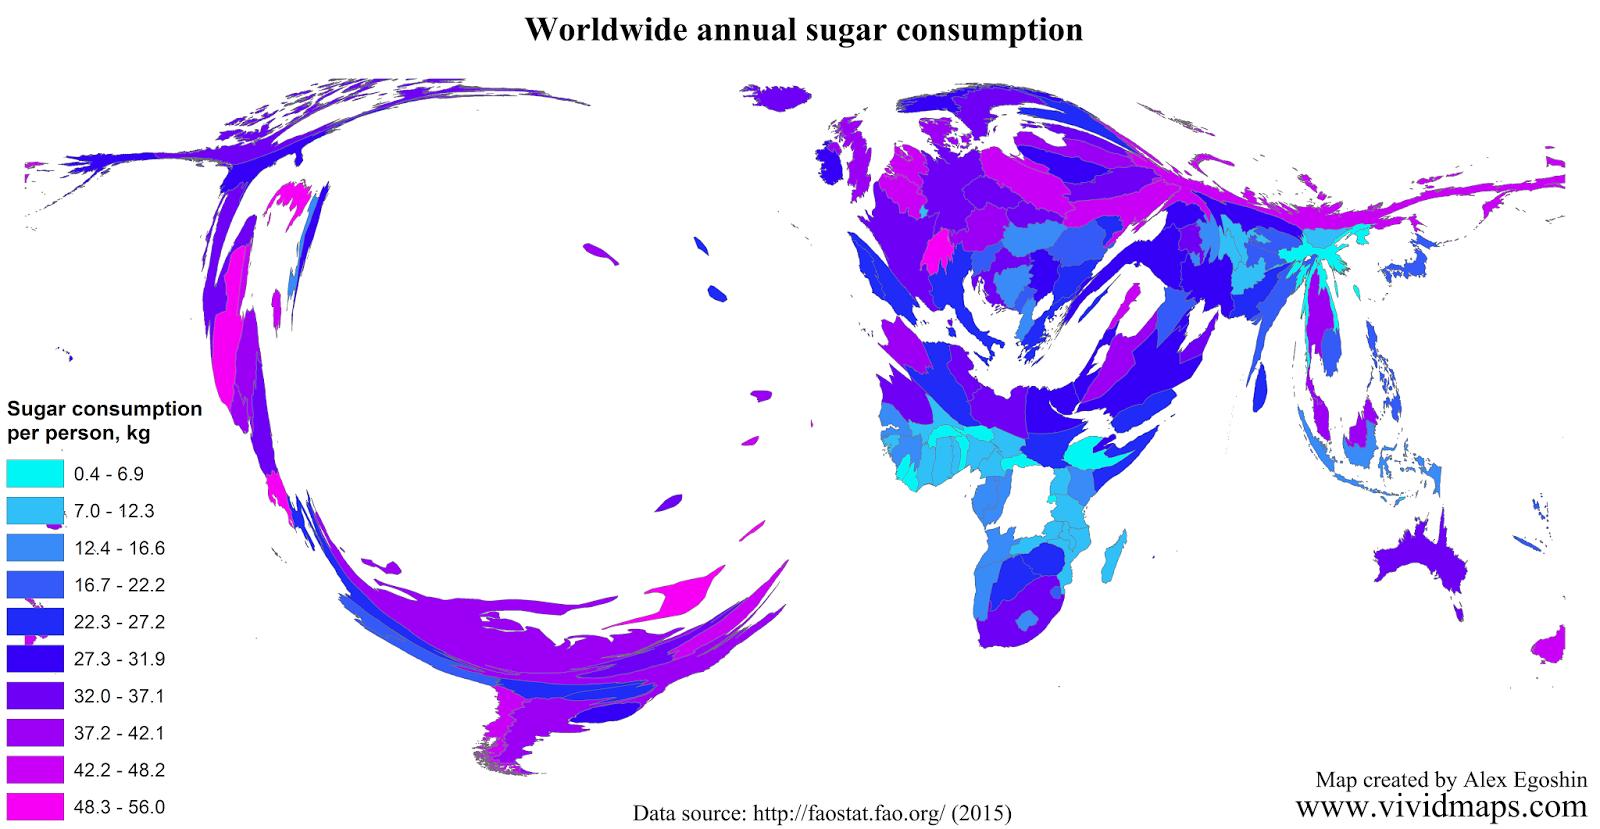 Worldwide annual sugar consumption